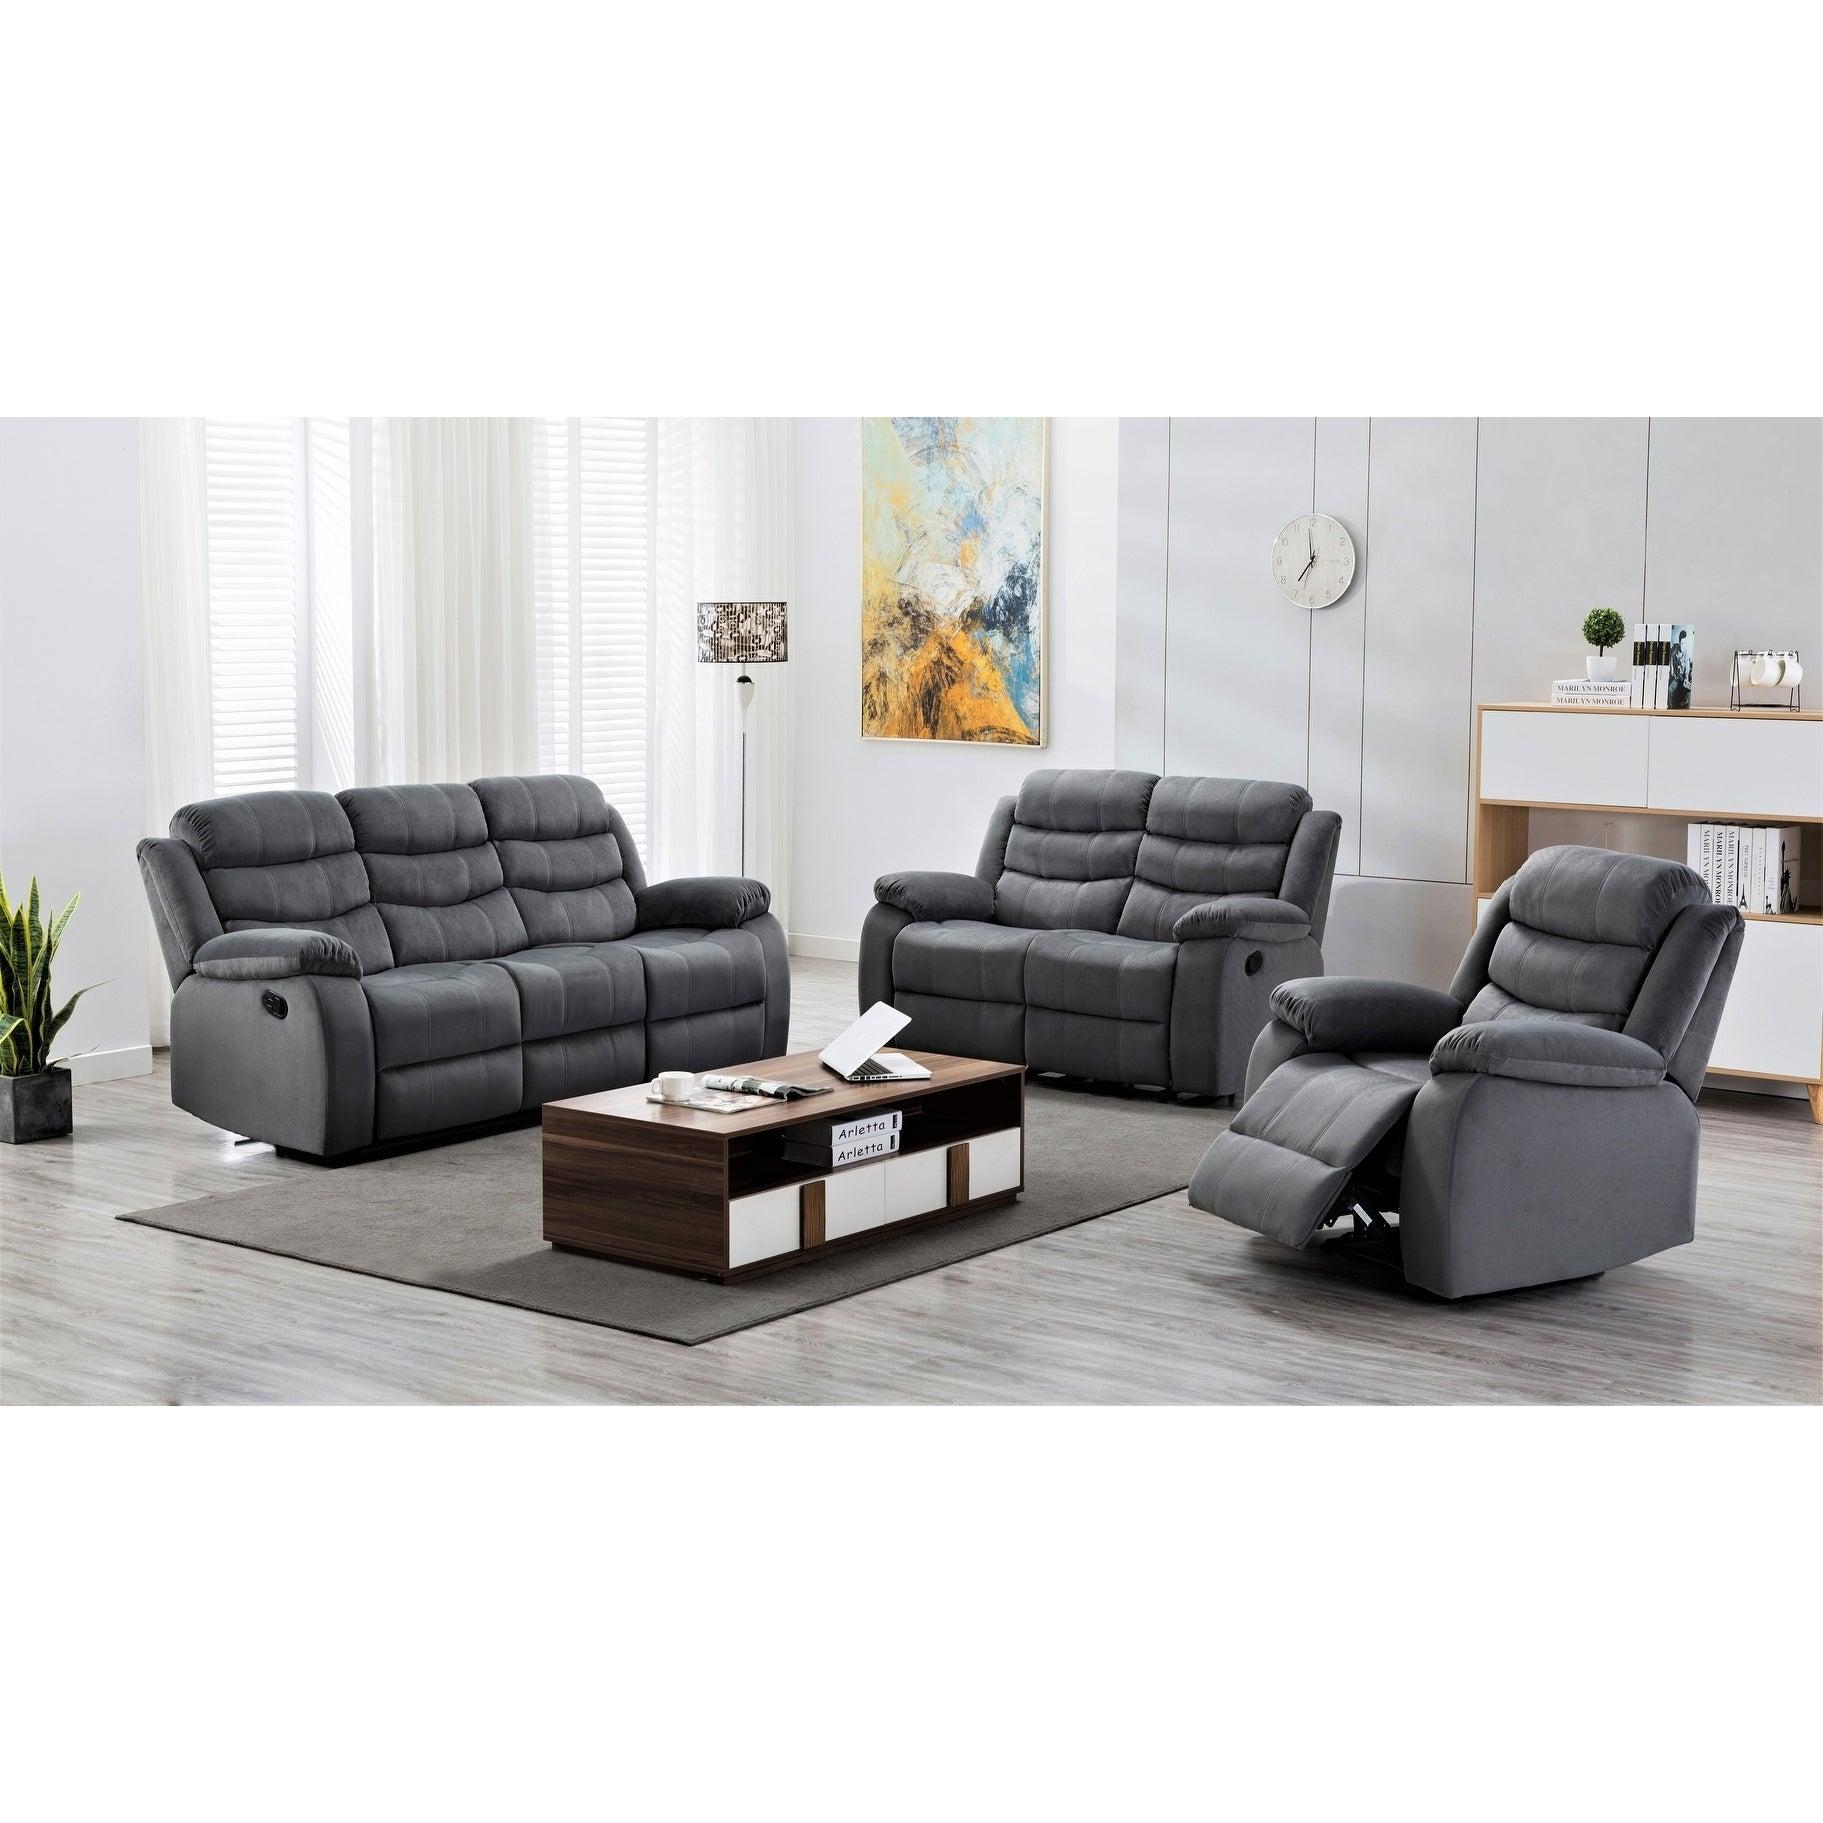 Terrific Medved 3 Piece Suede Reclining Living Room Set Evergreenethics Interior Chair Design Evergreenethicsorg